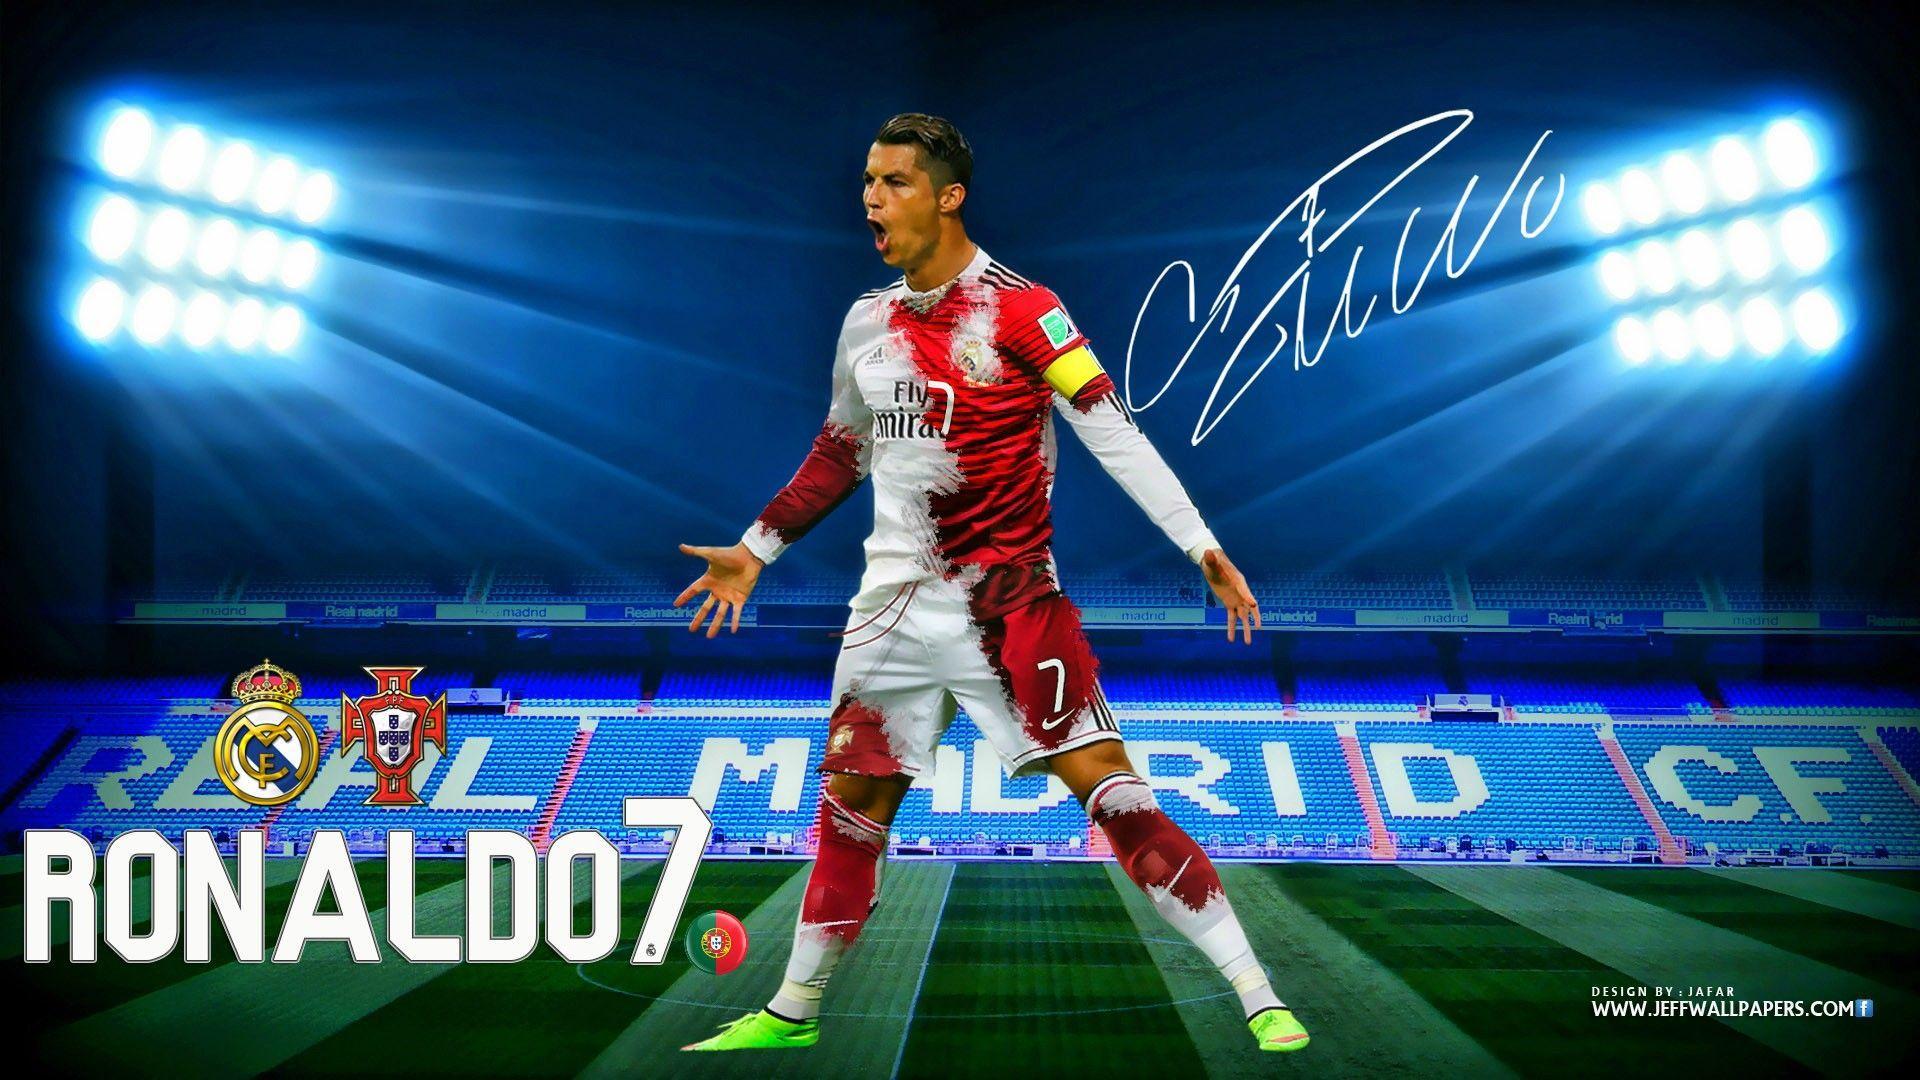 Cristiano Ronaldo CR7 Real Madrid Kit 2015 HD Wallpaper